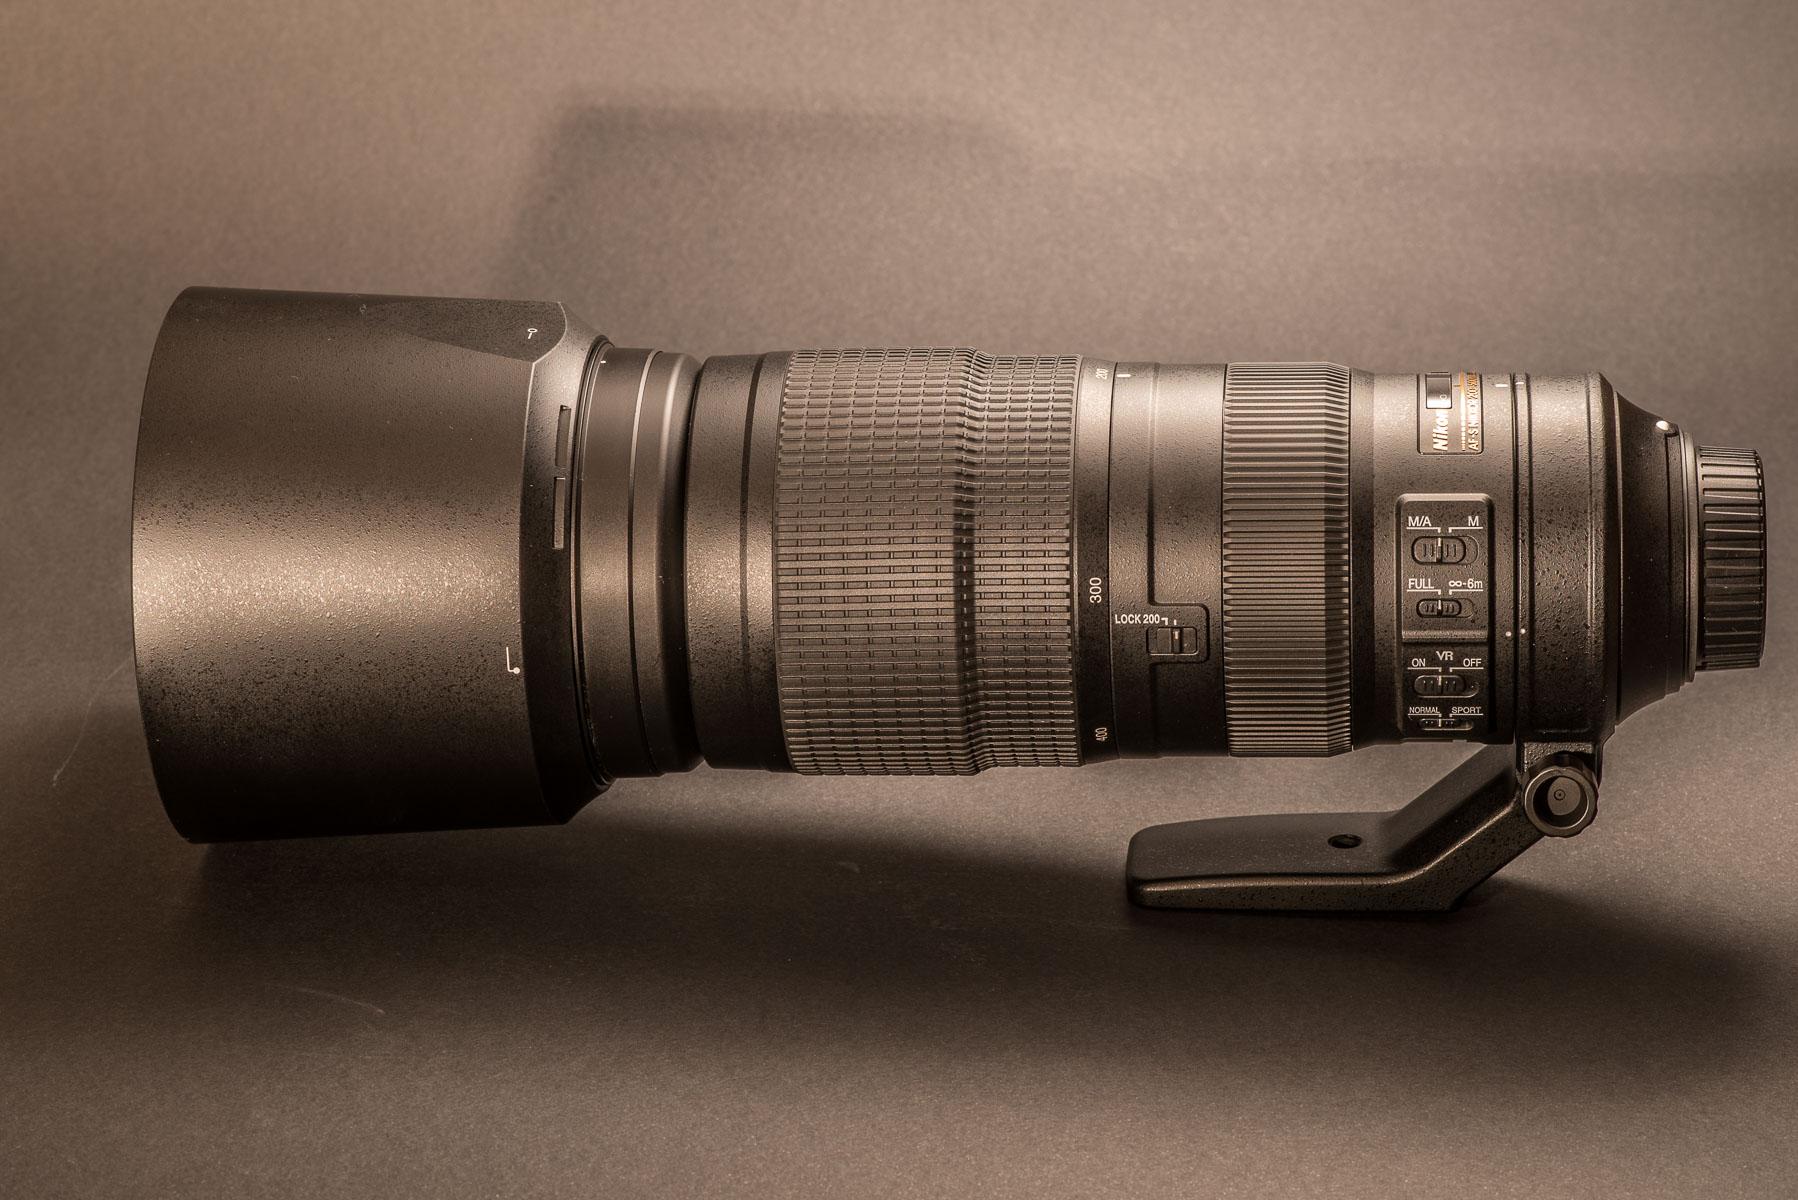 Nový teleobjektiv Nikkor 200-500mm f5.6 VR: první dojmy